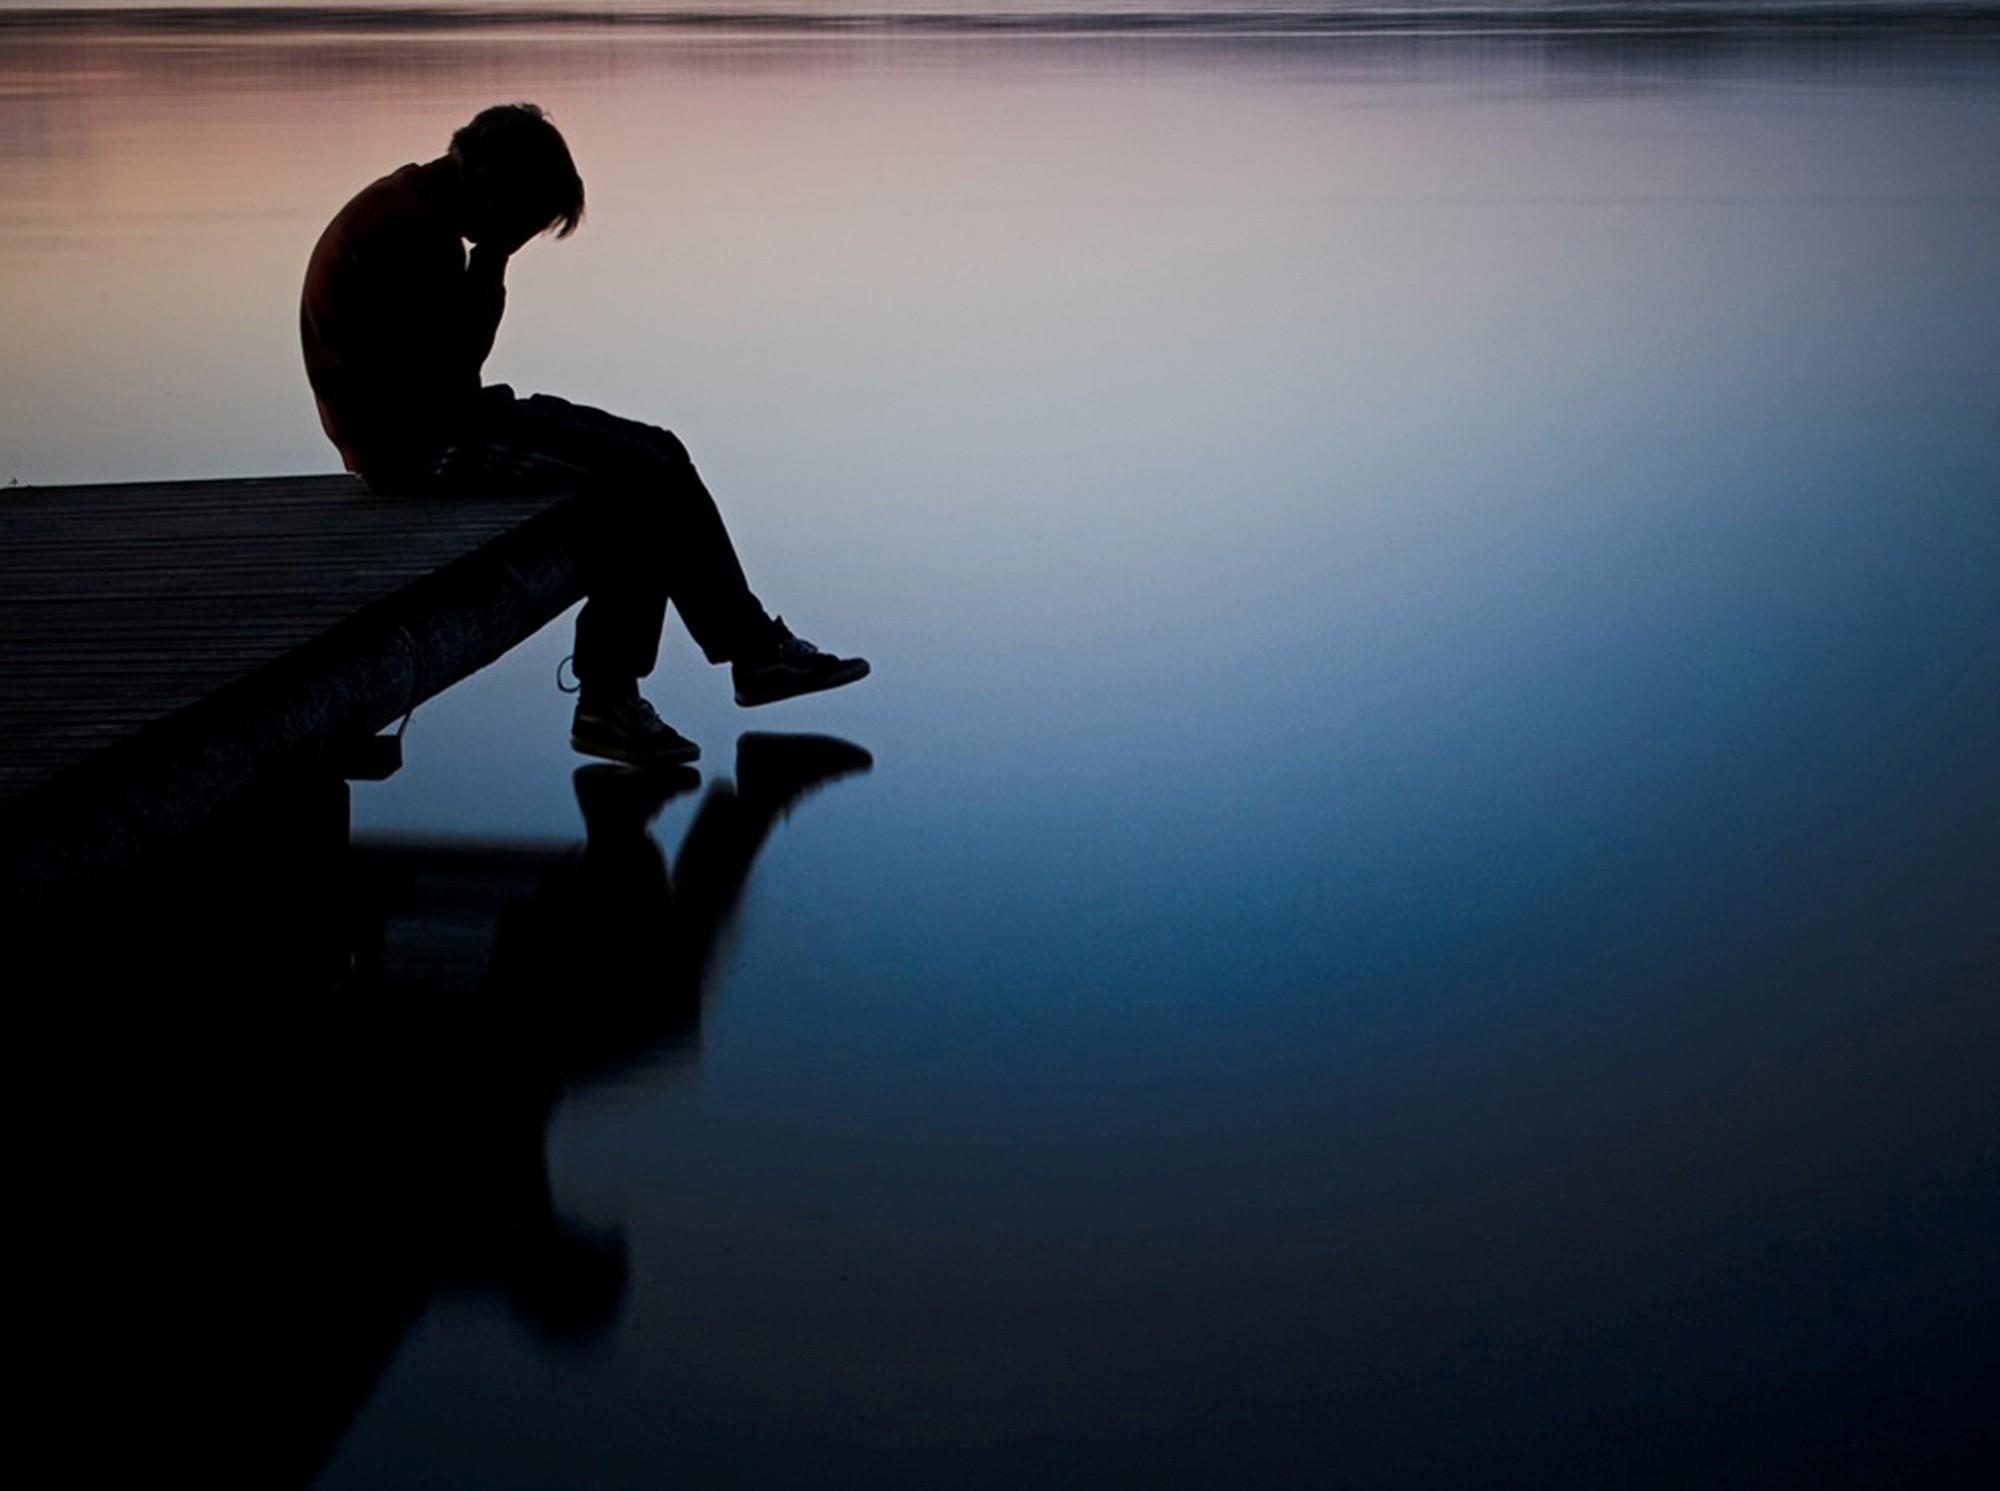 صور صور معبره حزينه , صور ذات معنى